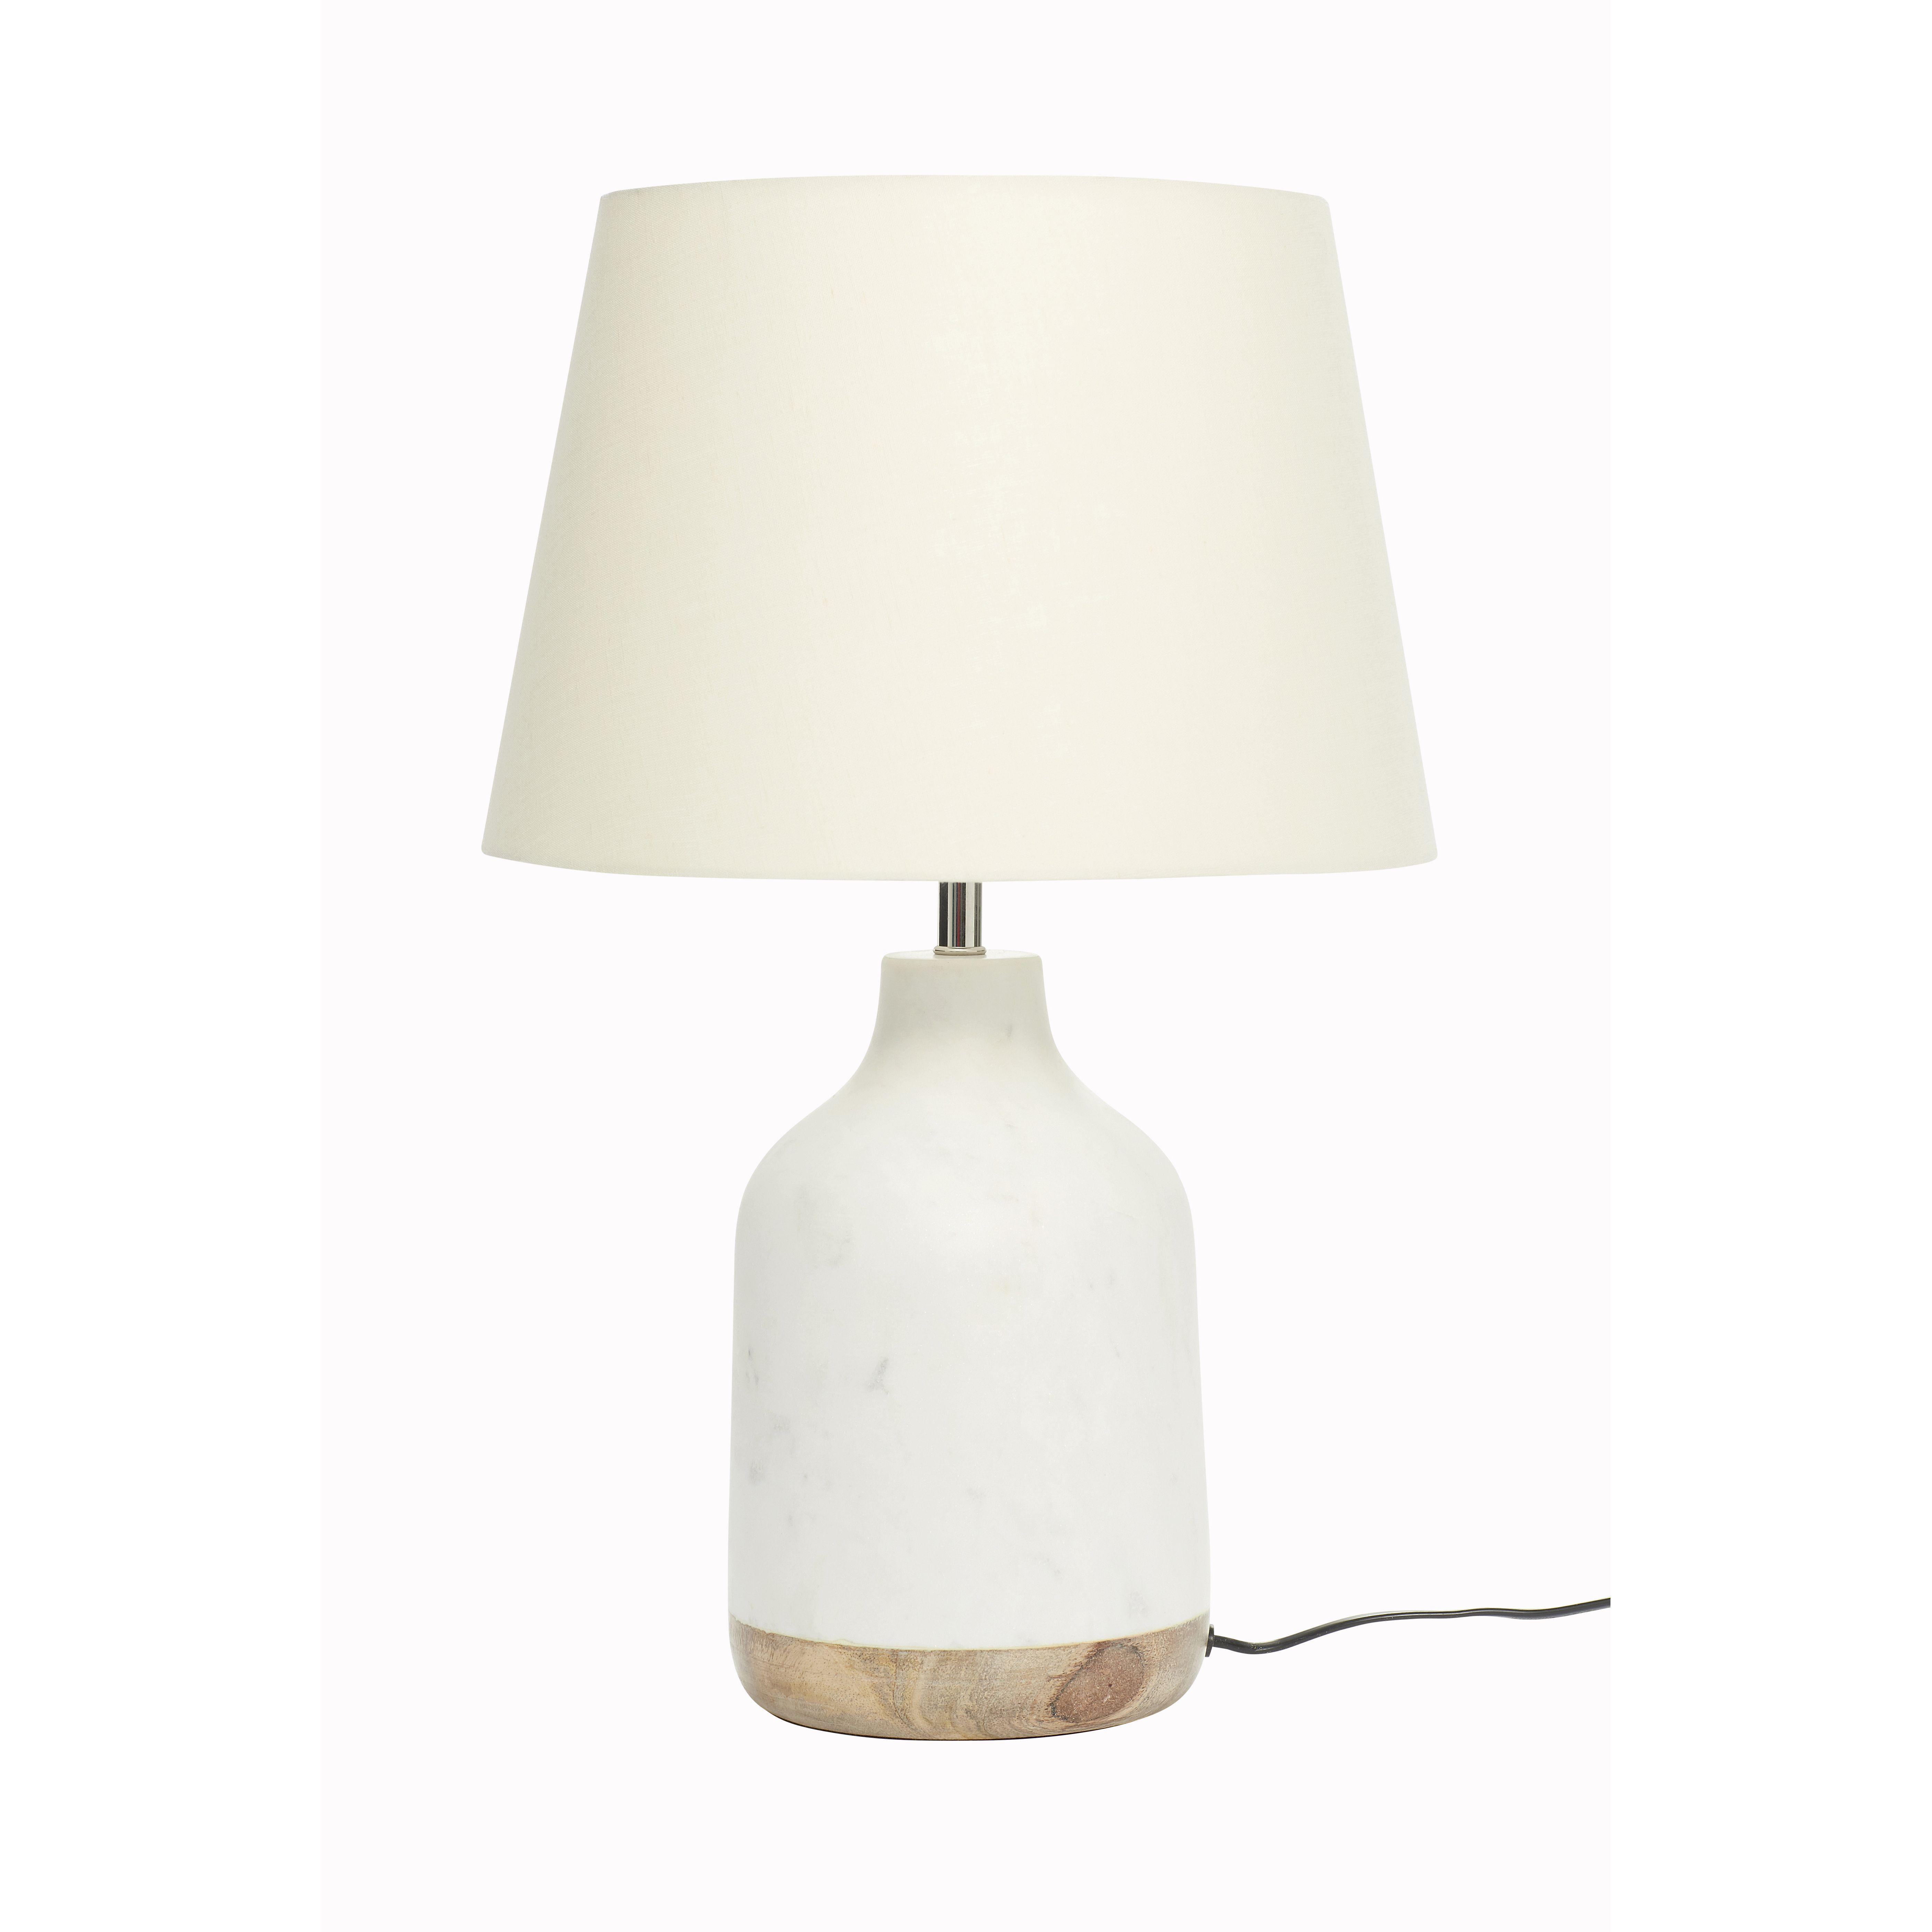 Table lamp w white shade marble mango wood white nature Product